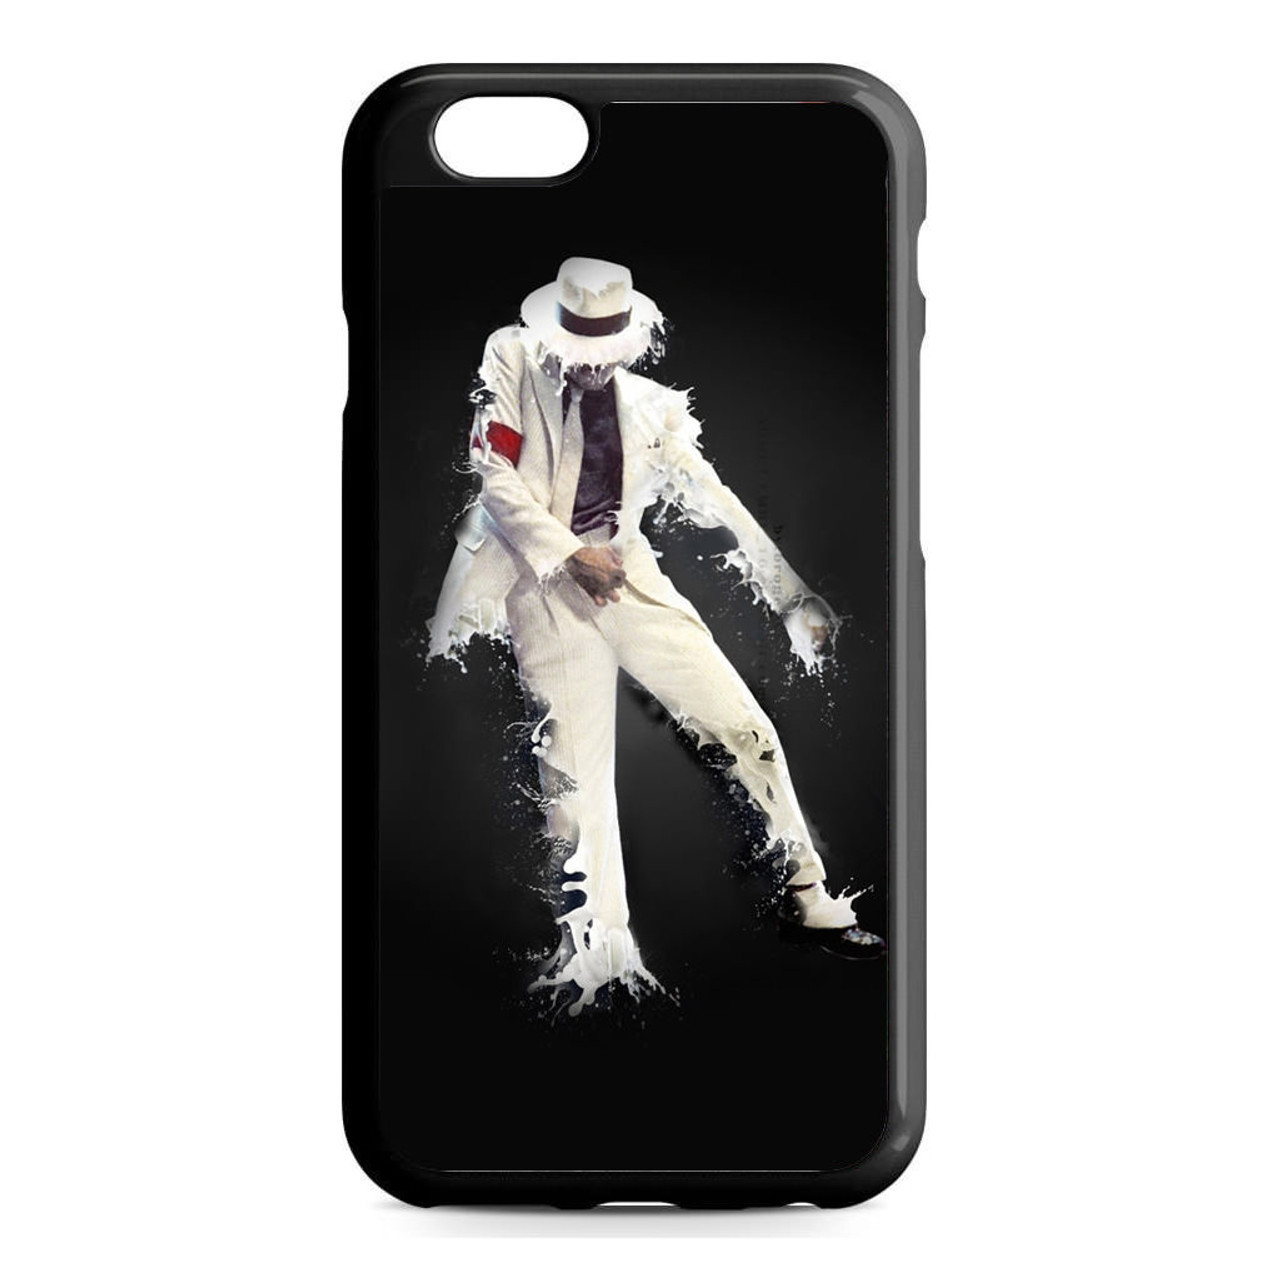 new style c378c 8c313 Michael Jackson iPhone 6/6S Case